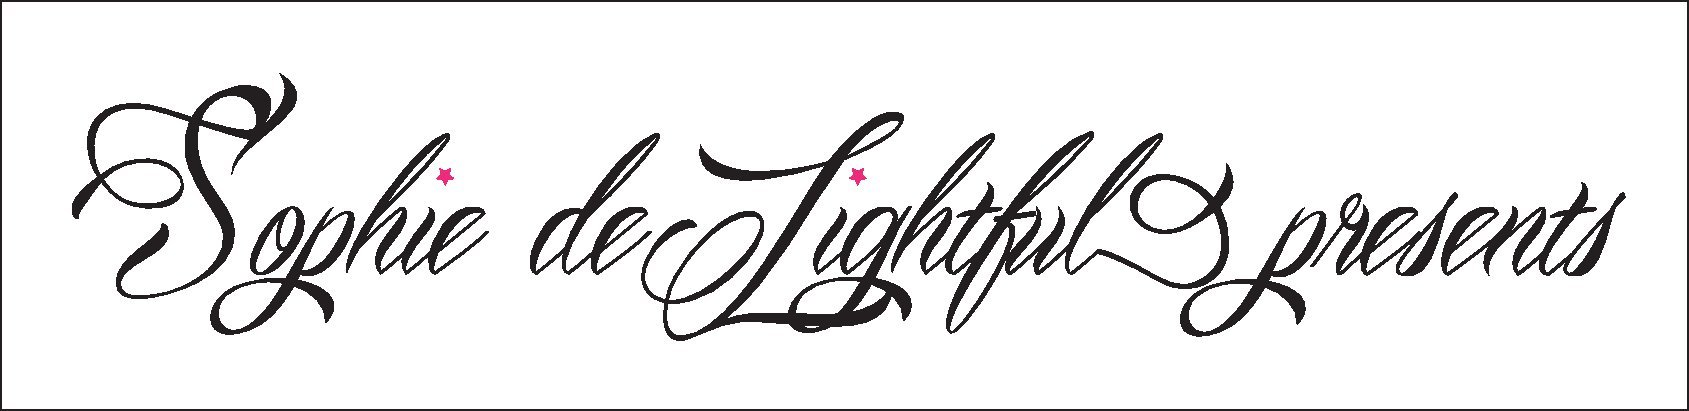 Sophie_deLightful_finals_logo_presents_blacktext_w